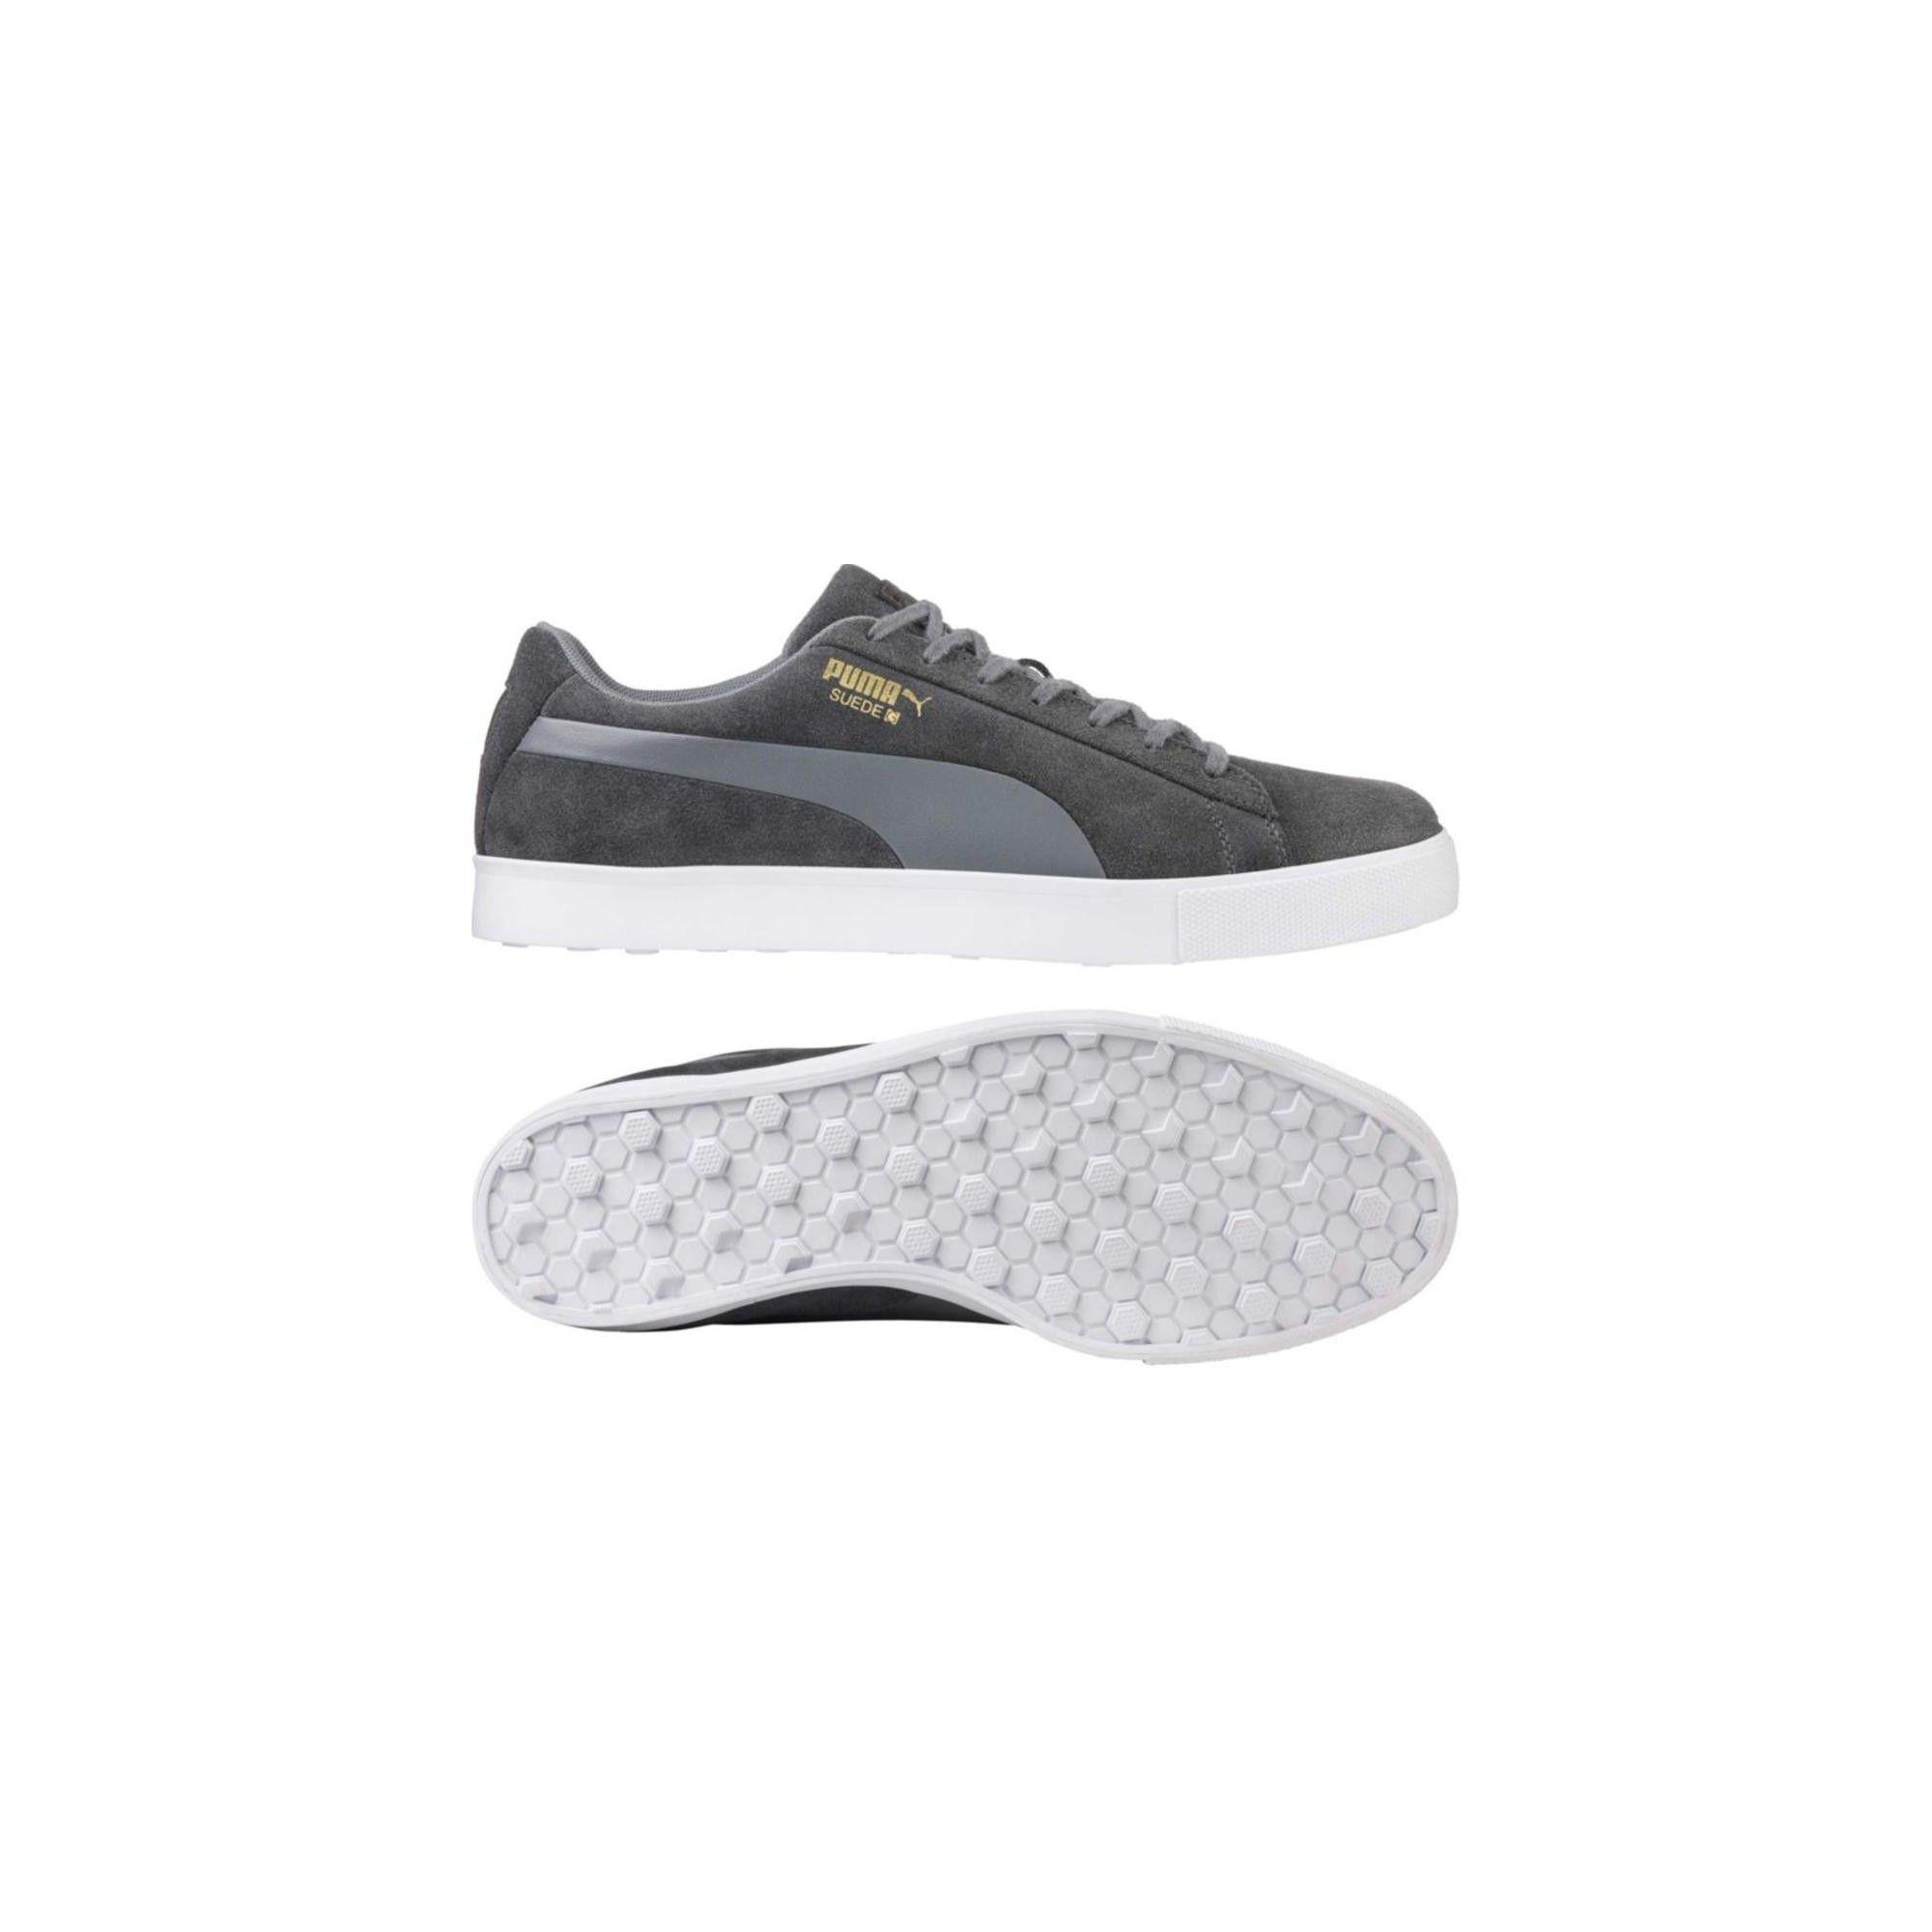 huge discount 2fc38 978f8 Men's Puma Suede G Spikeless Golf Shoes Quiet Shade 12 ...